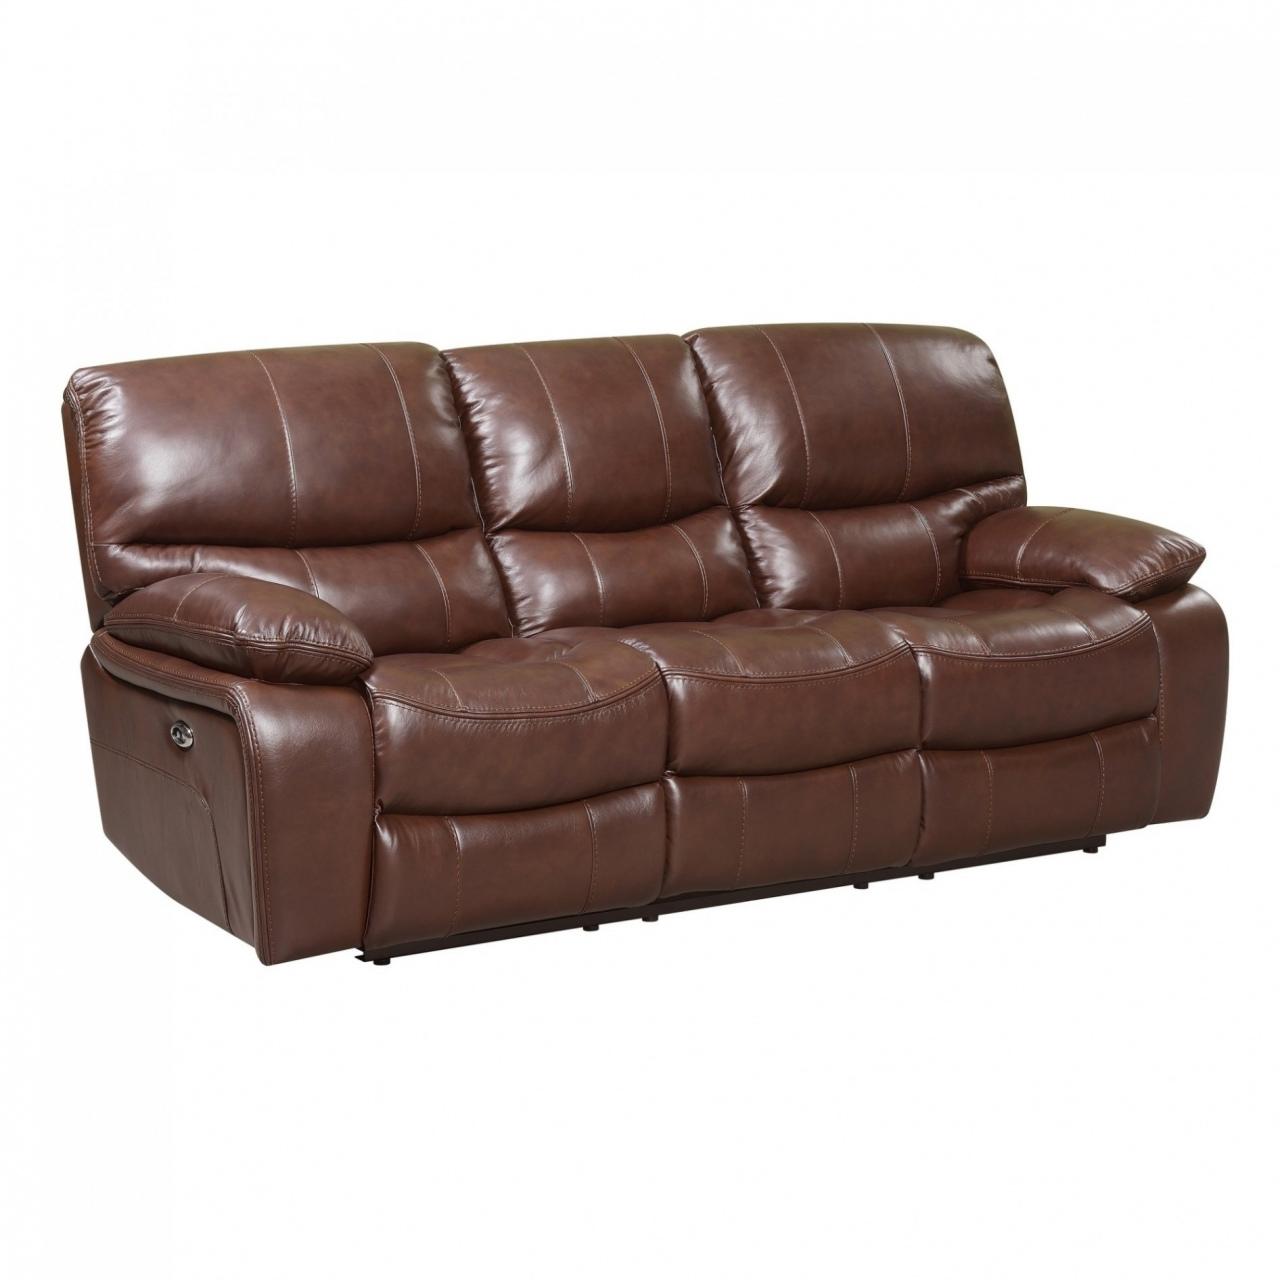 Full Size of Ausgefallene Sofas 15 Best Of Kommoden Sideboards Betten Möbelgriffe Küche Wohnzimmer Ausgefallene Möbelgriffe